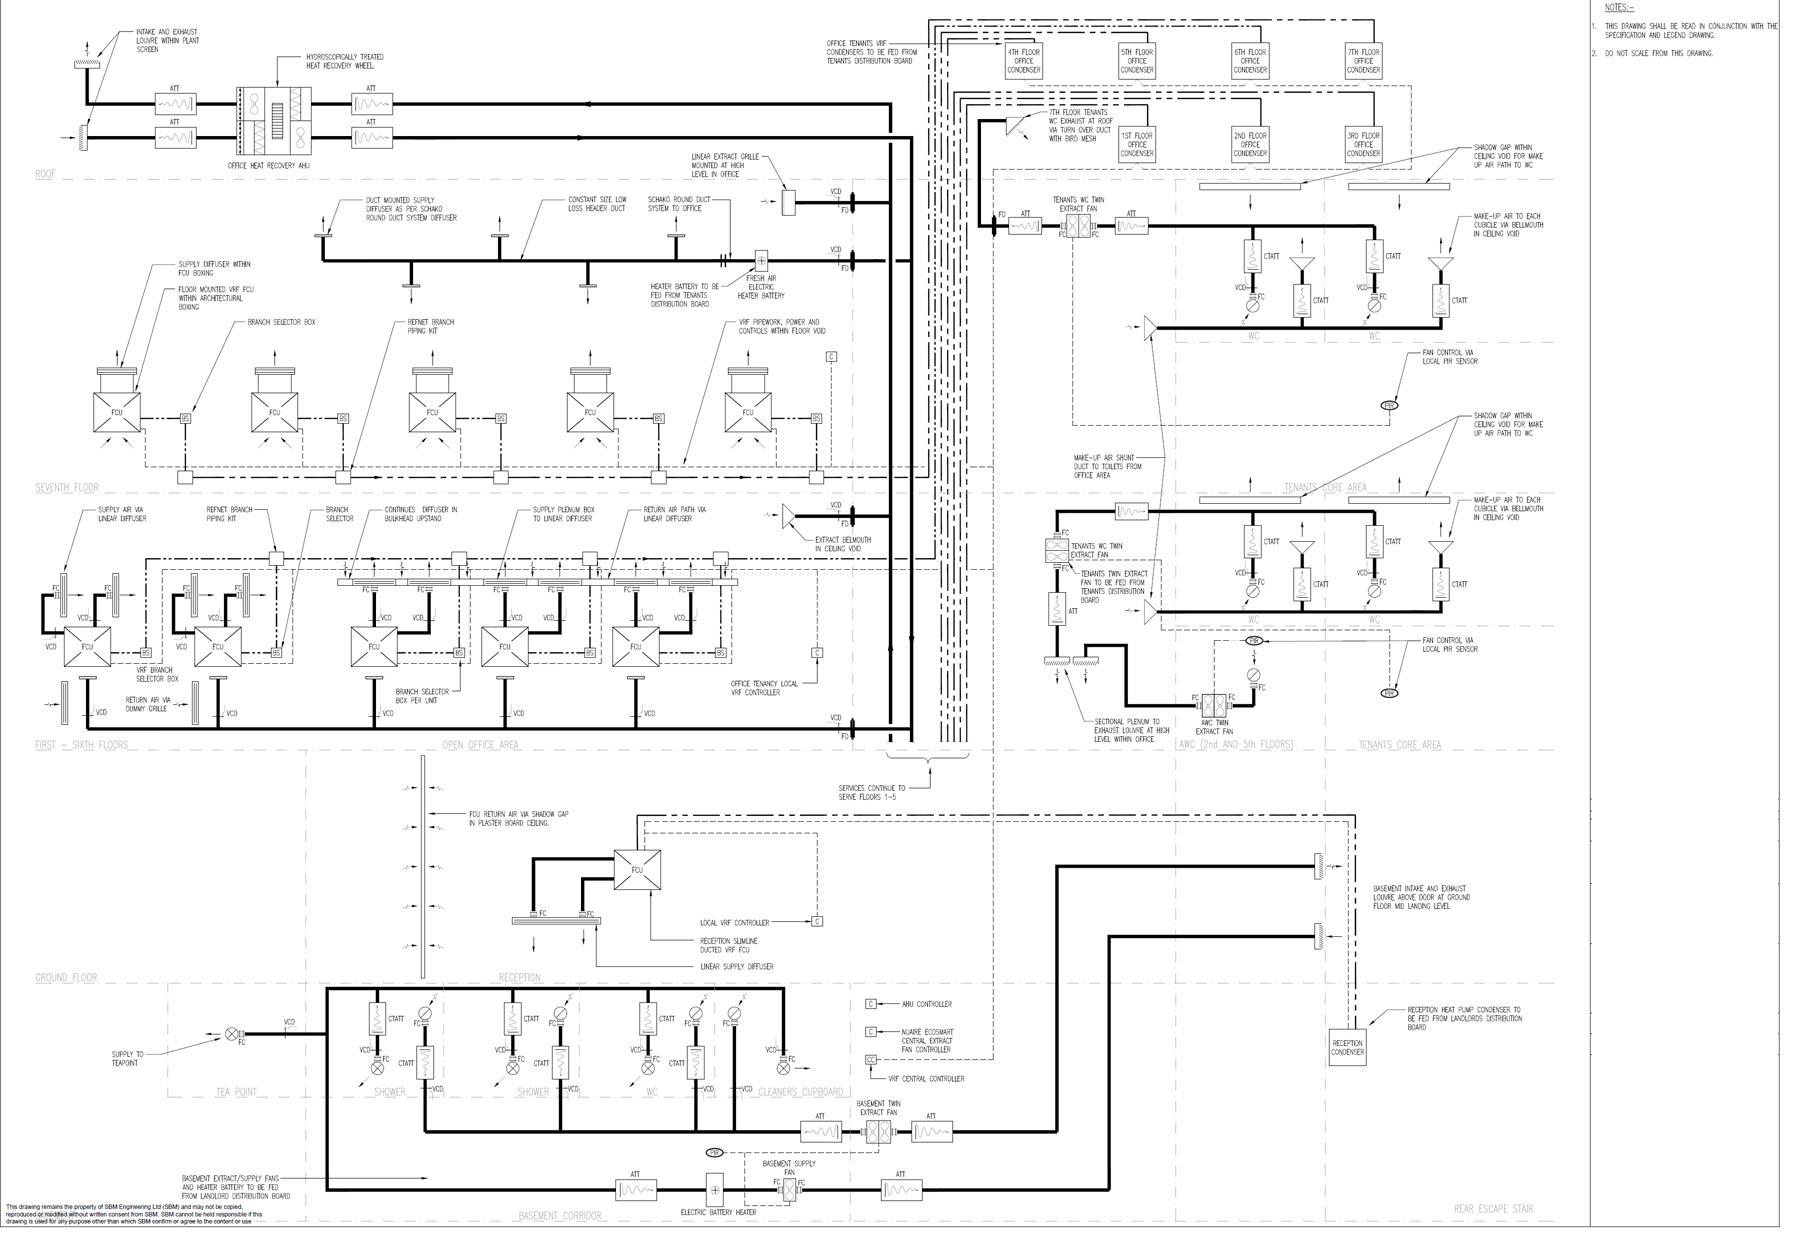 M&E Schematics - SGBCAD DESIGN LTD on